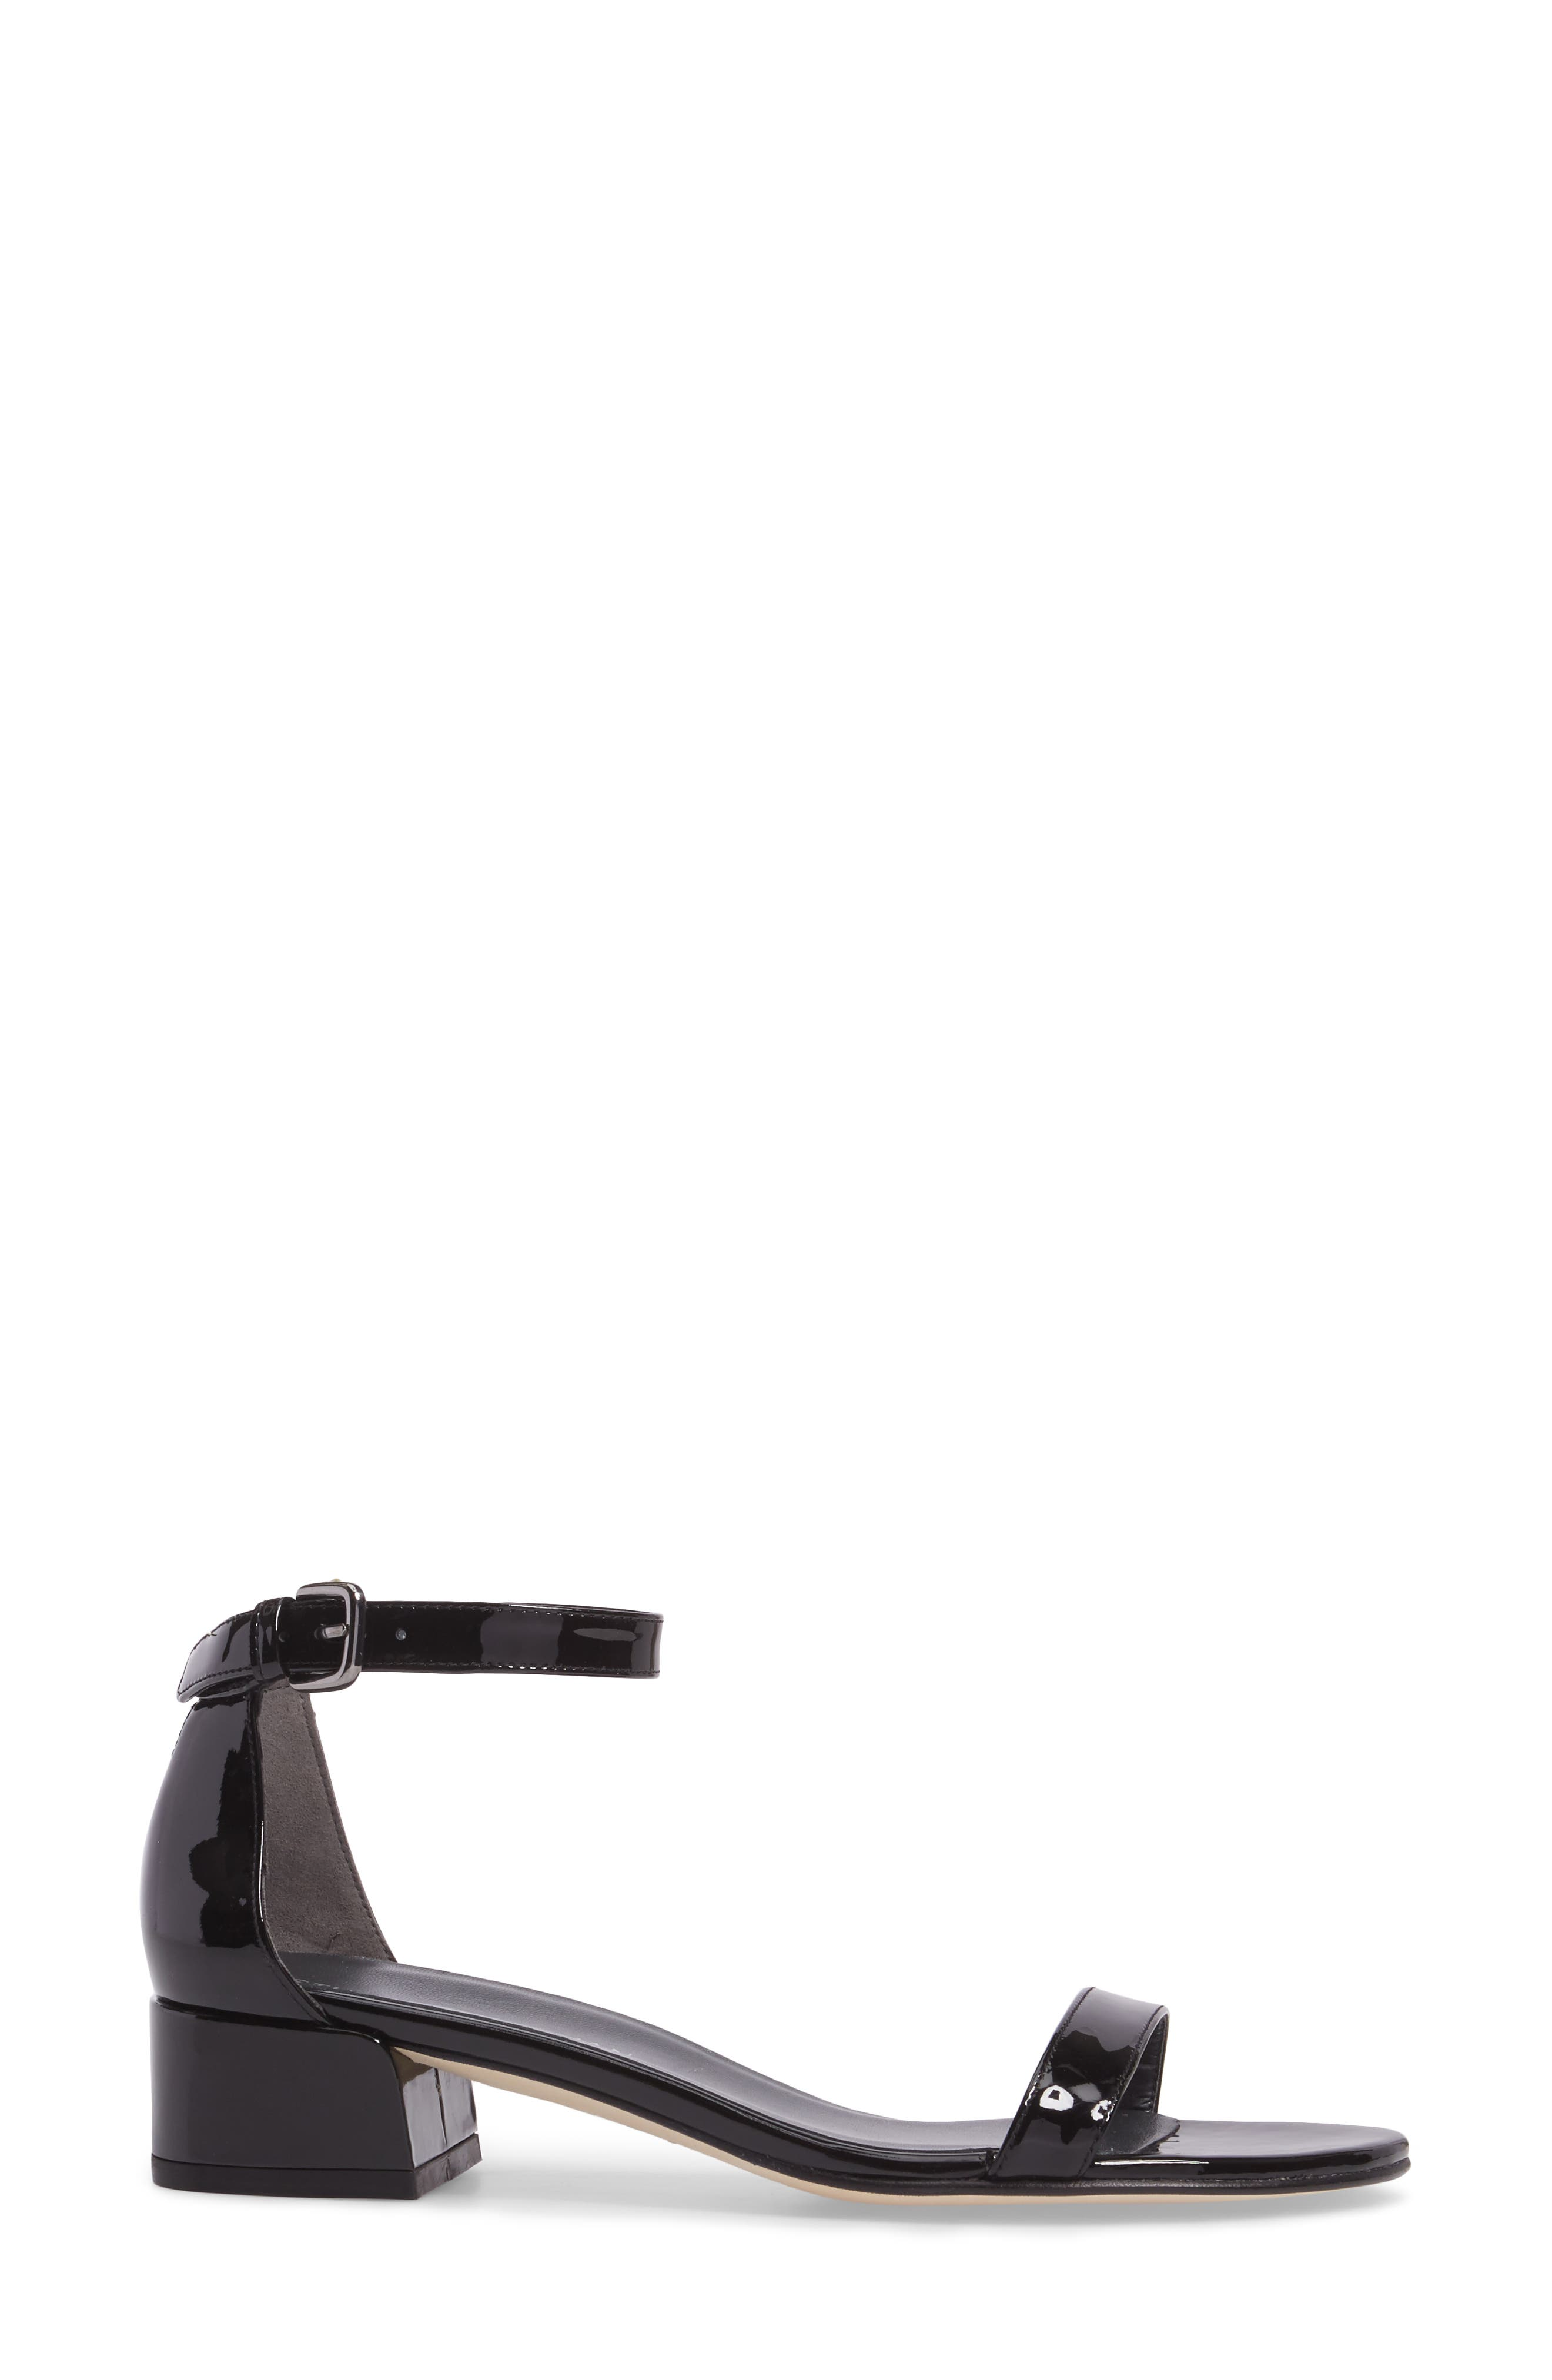 NudistJune Block Heel Sandal,                             Alternate thumbnail 3, color,                             002